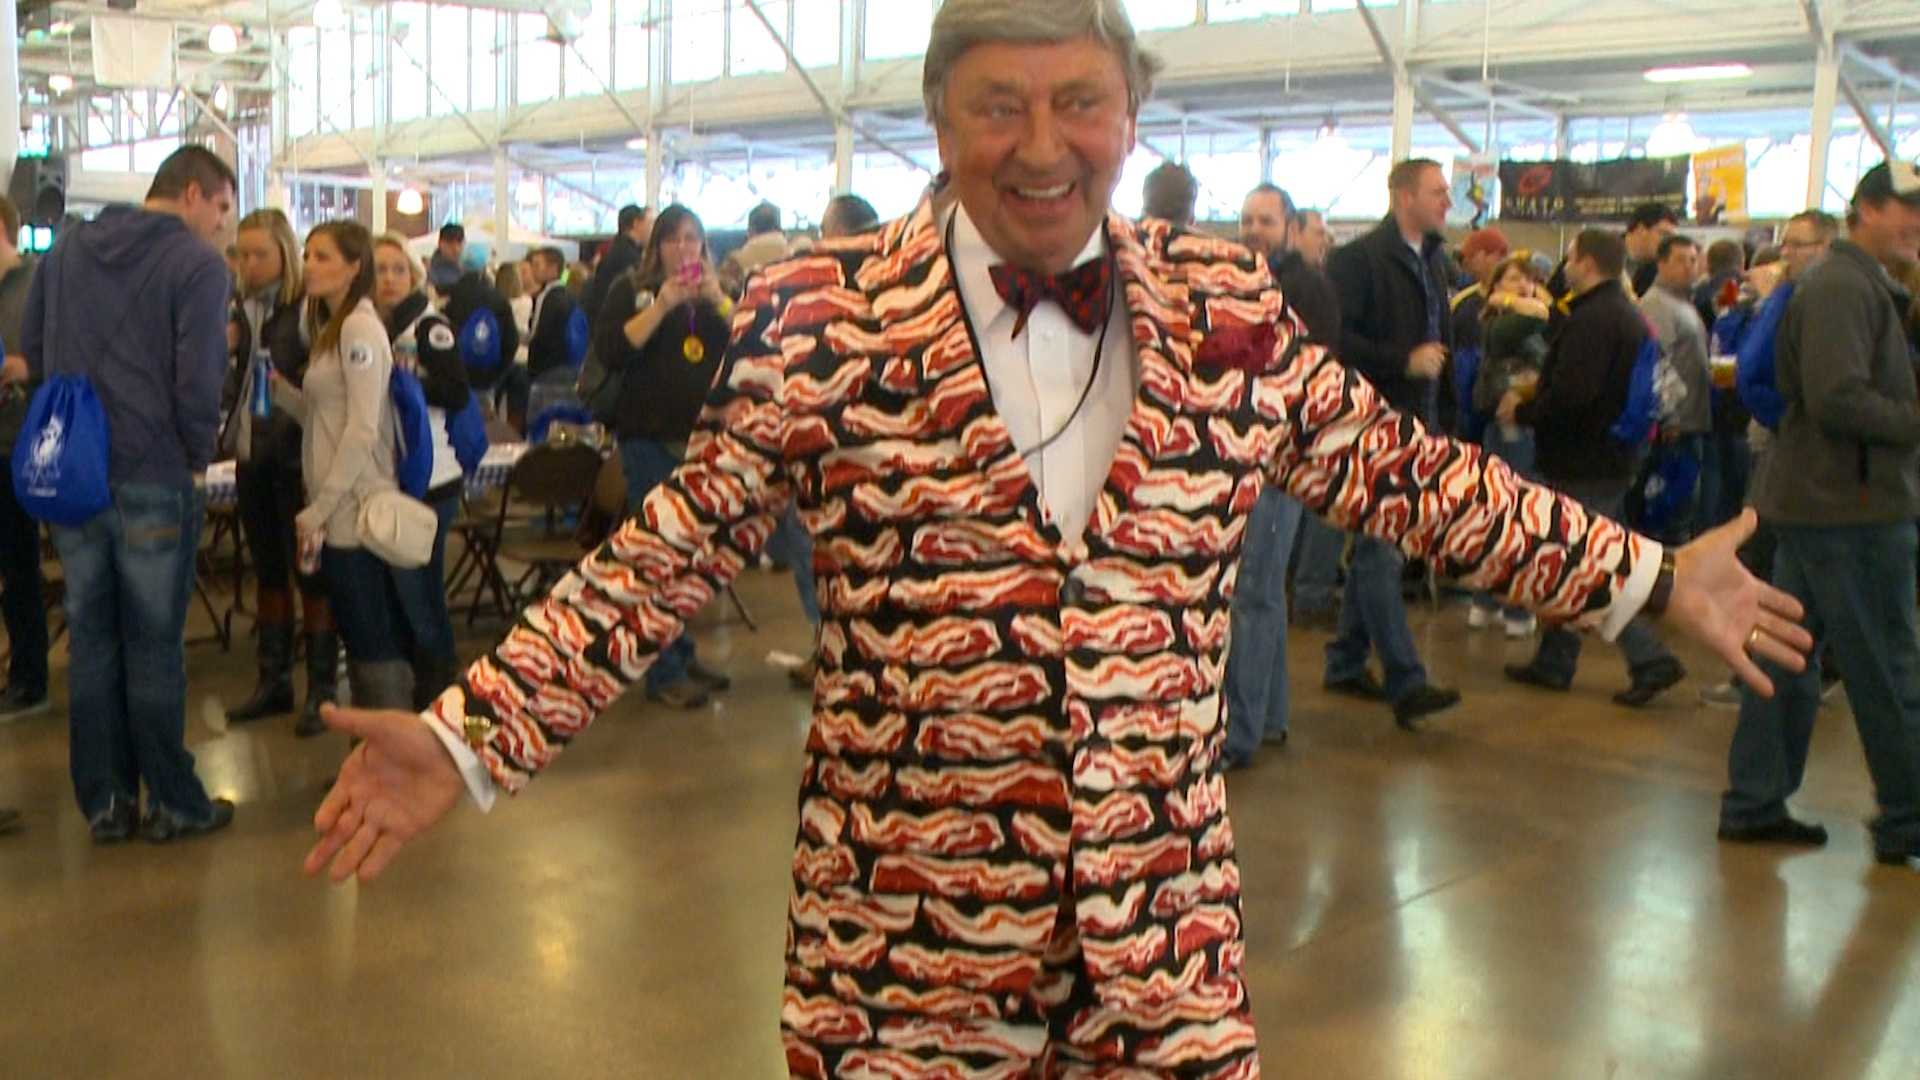 Blue Ribbon Bacon Festival brings out bacon fans